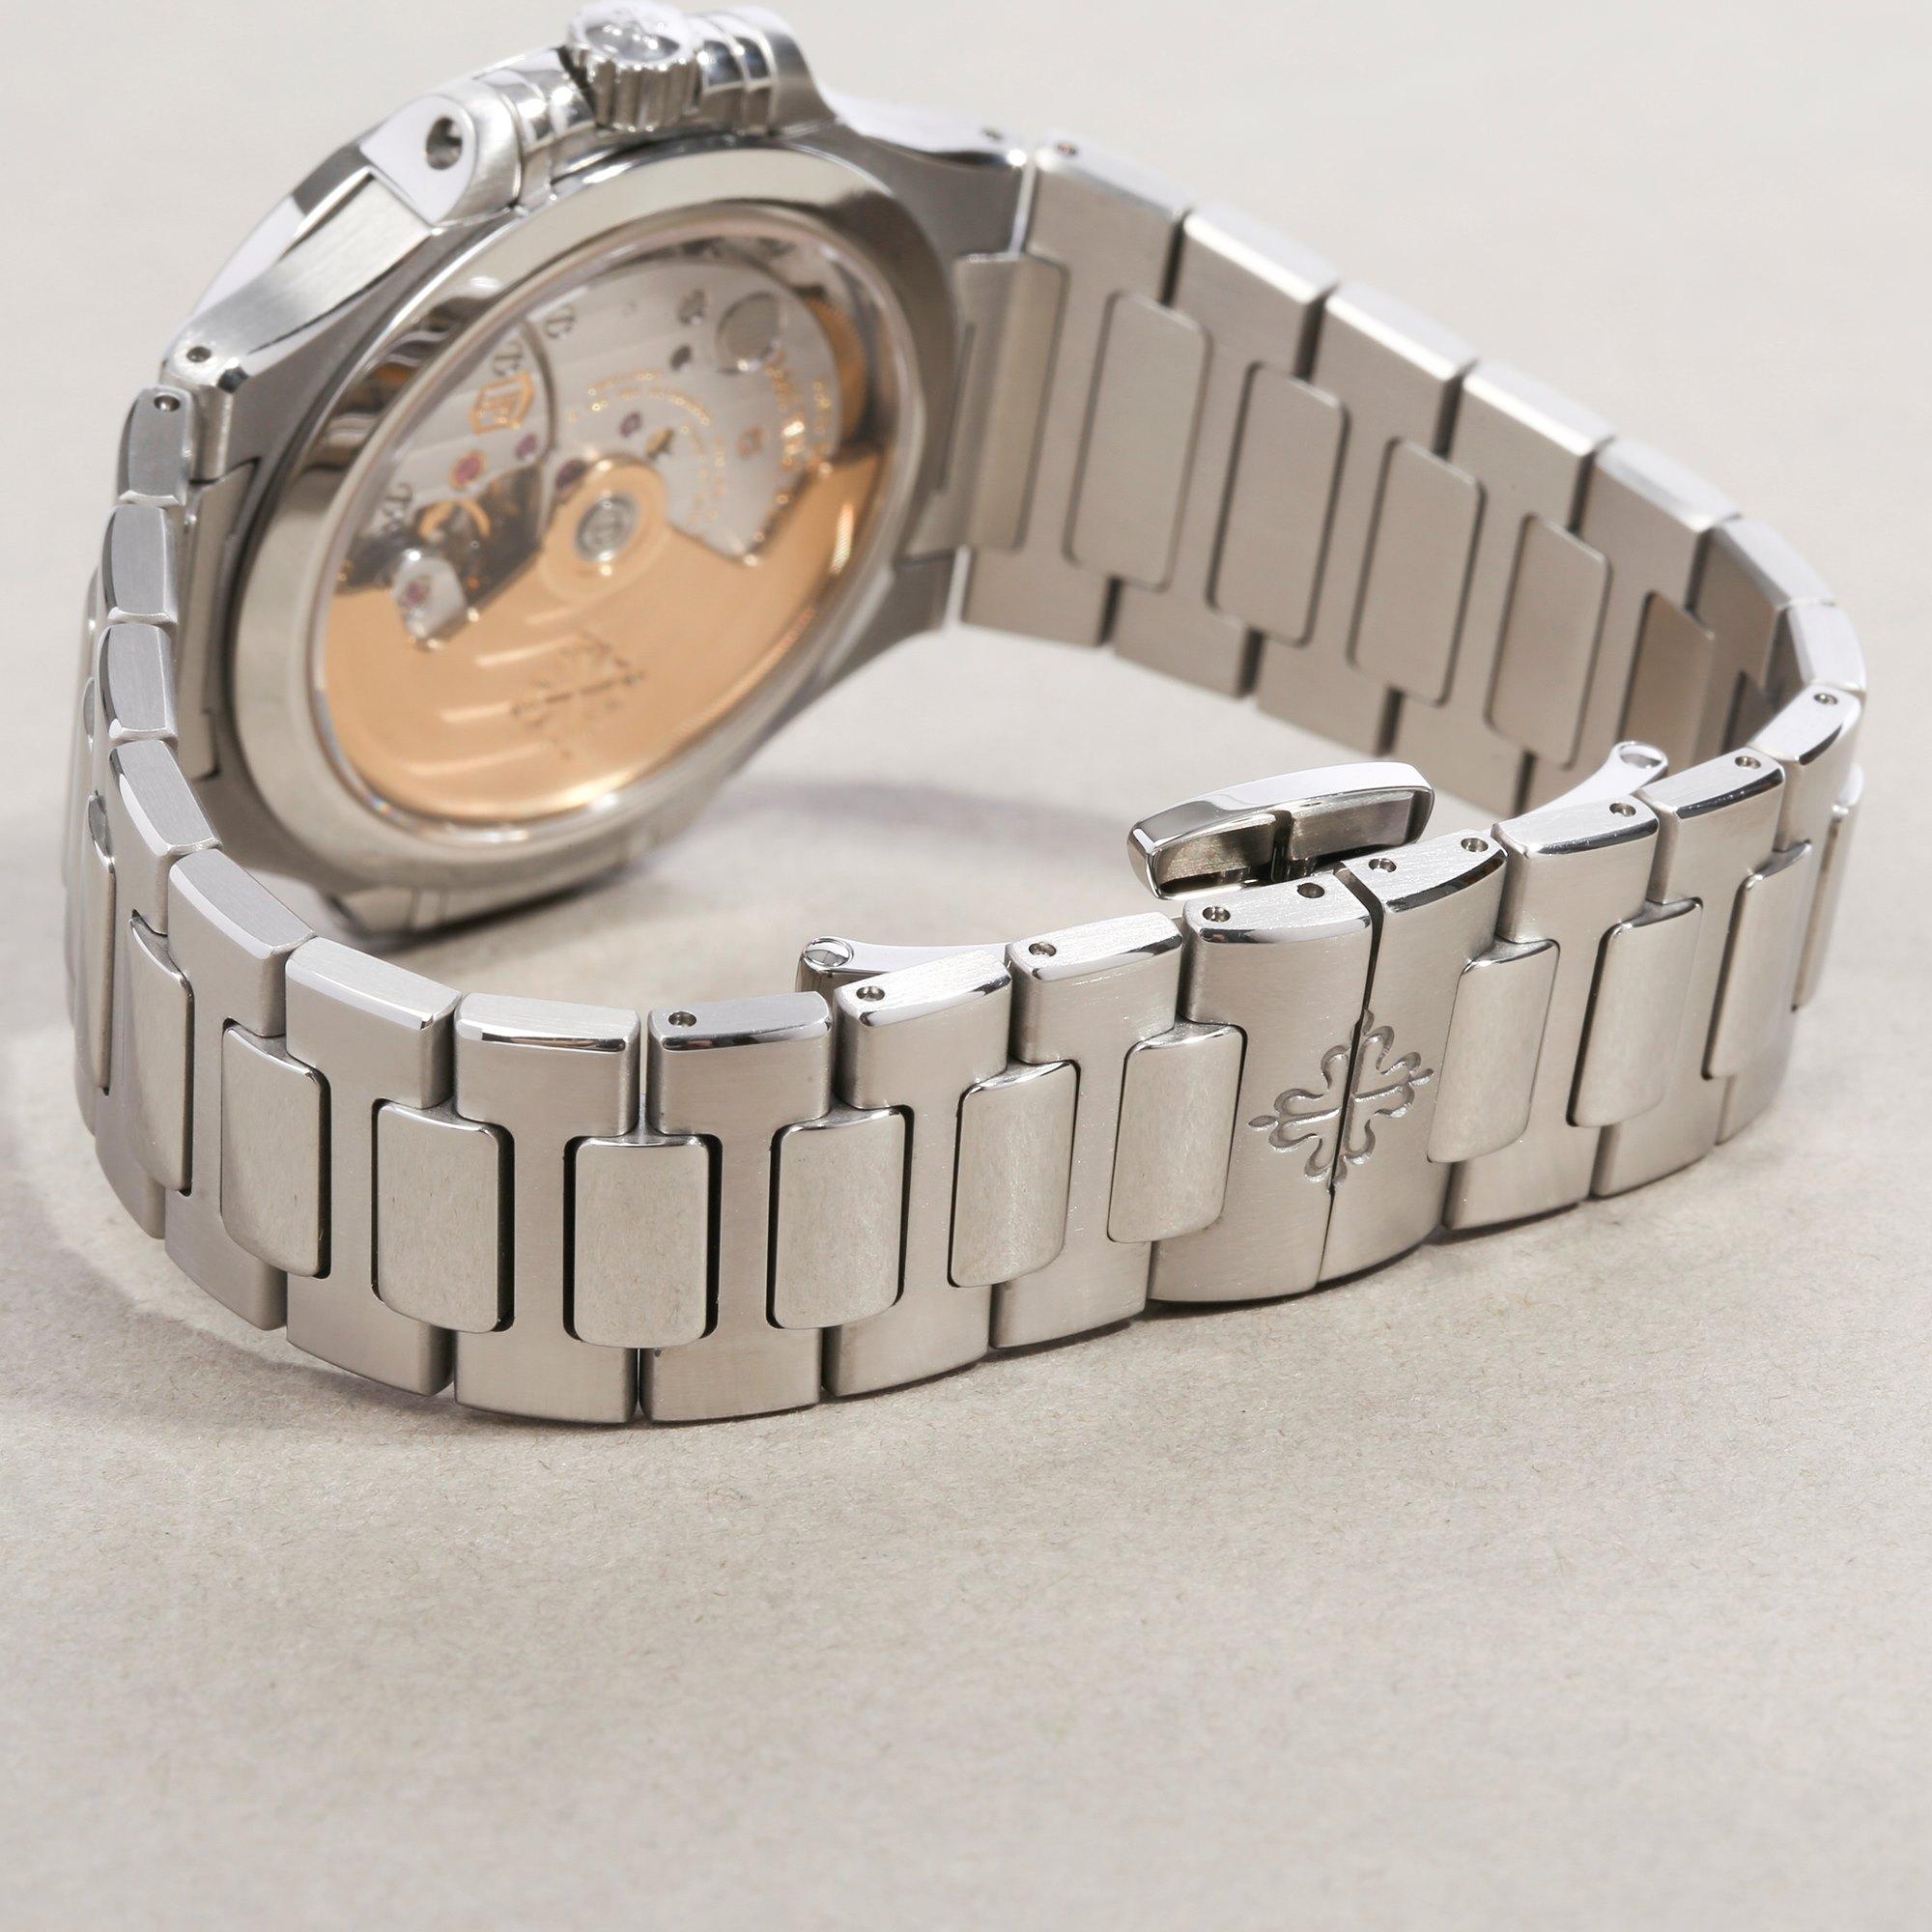 Patek Philippe Nautilus Stainless Steel 7118/1A-001